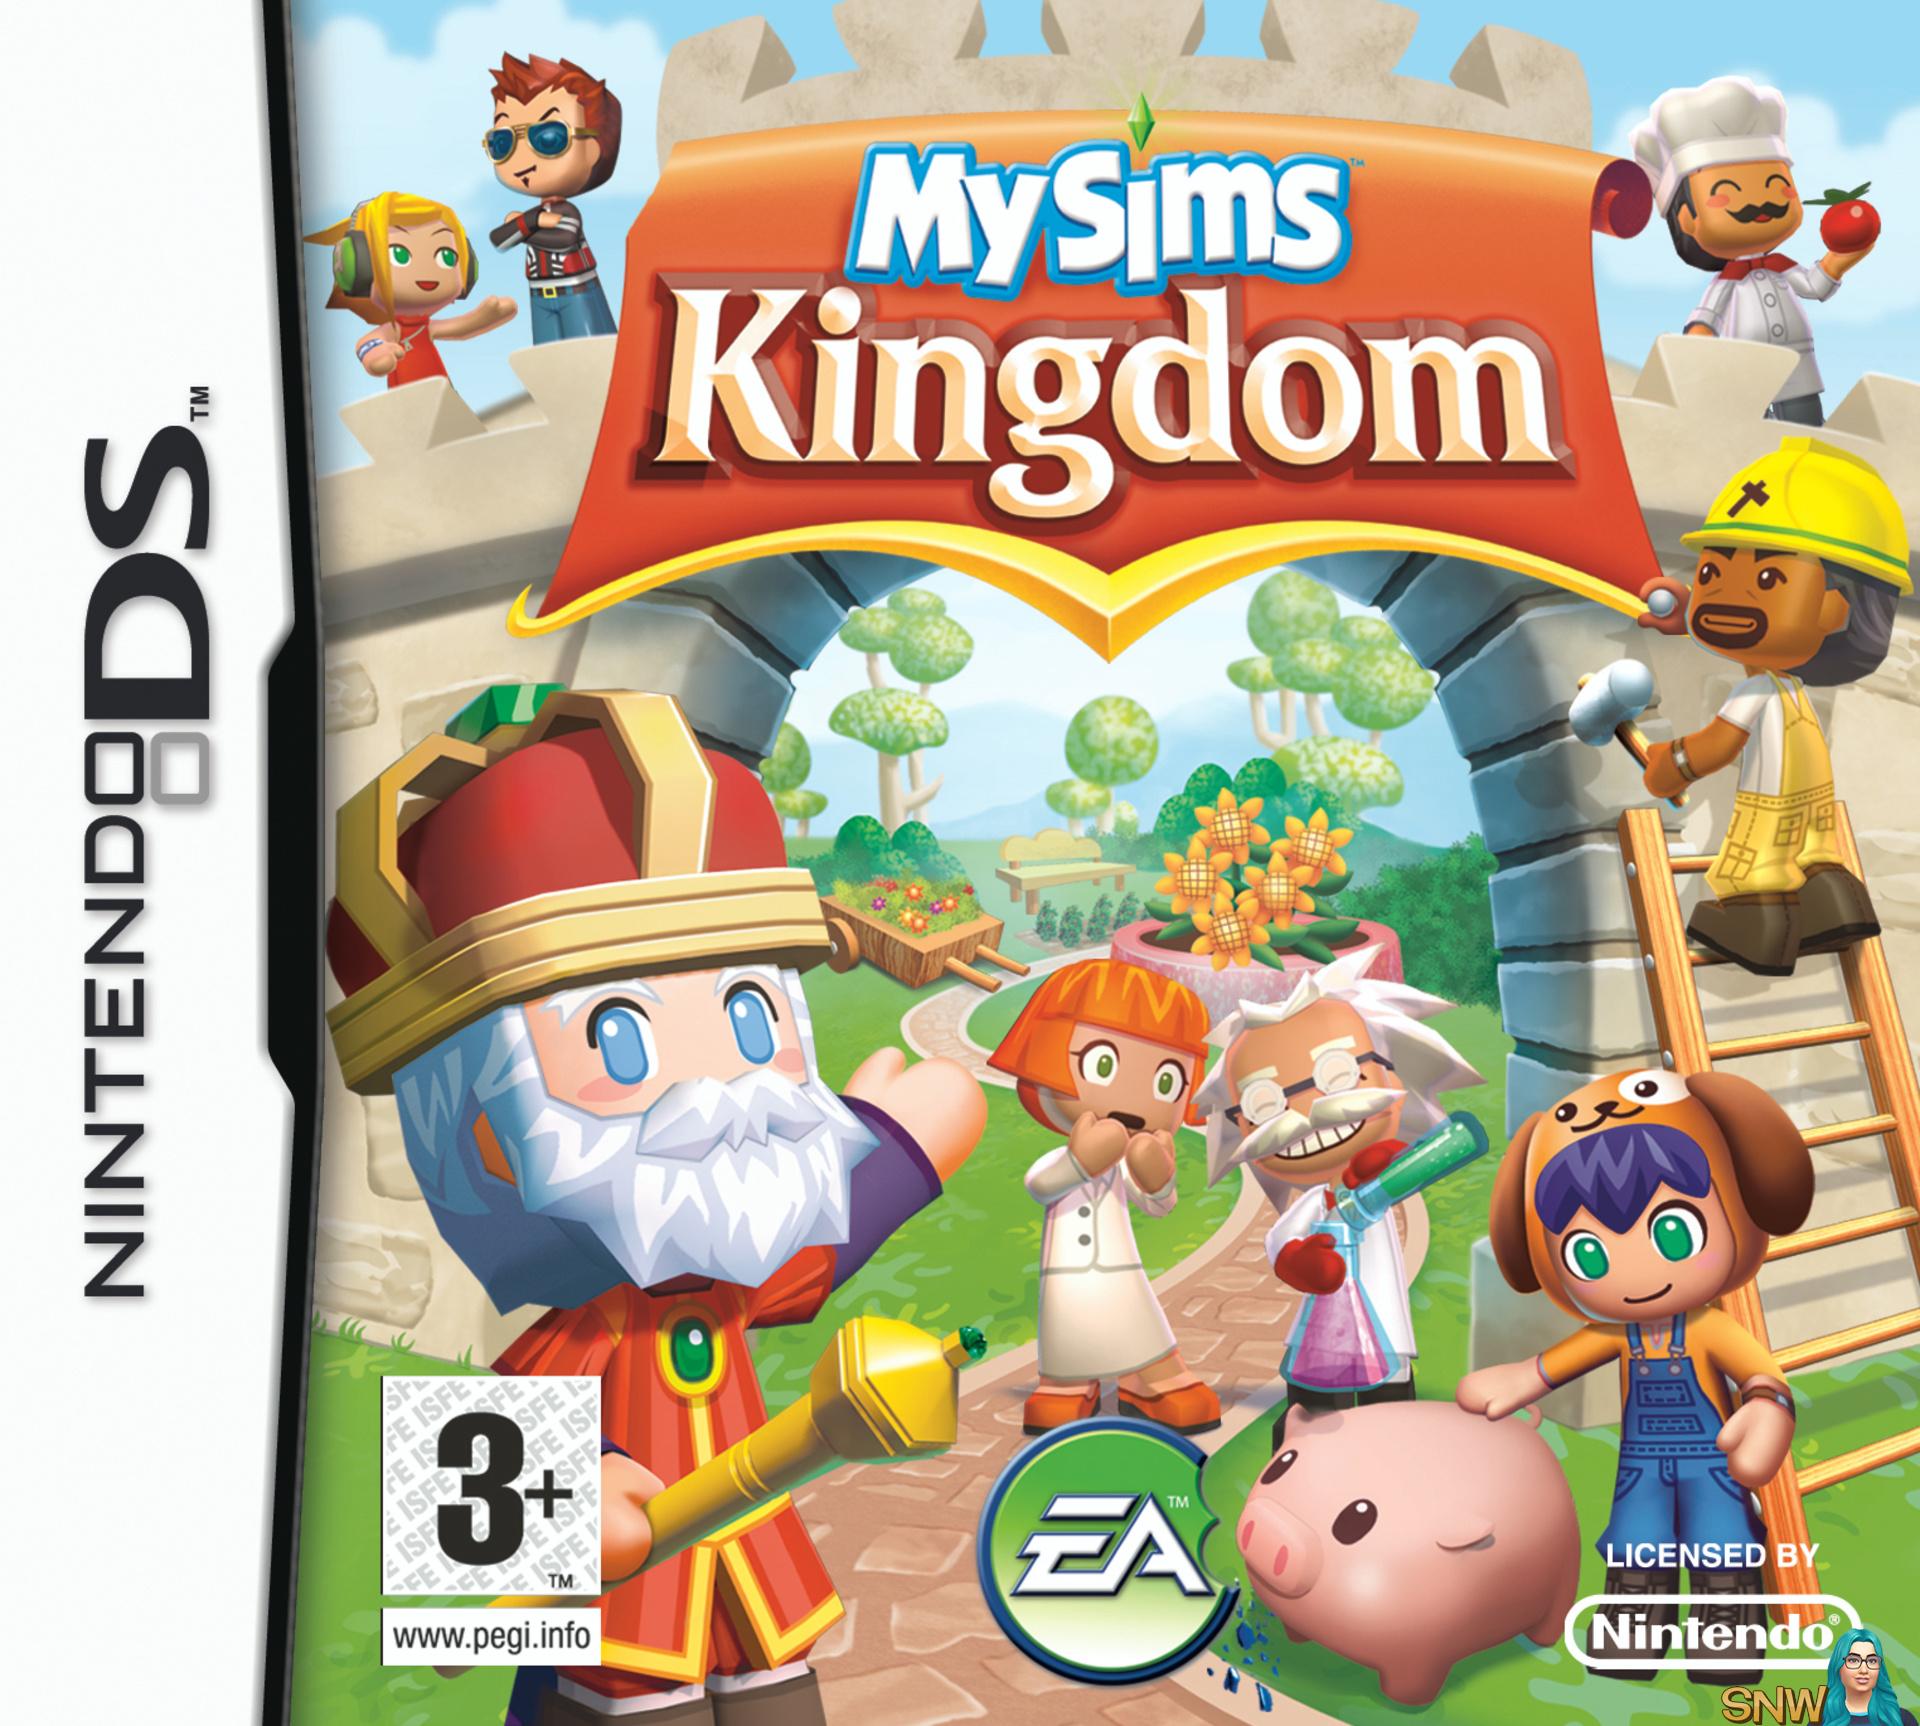 Mysims Kingdom Ds Box